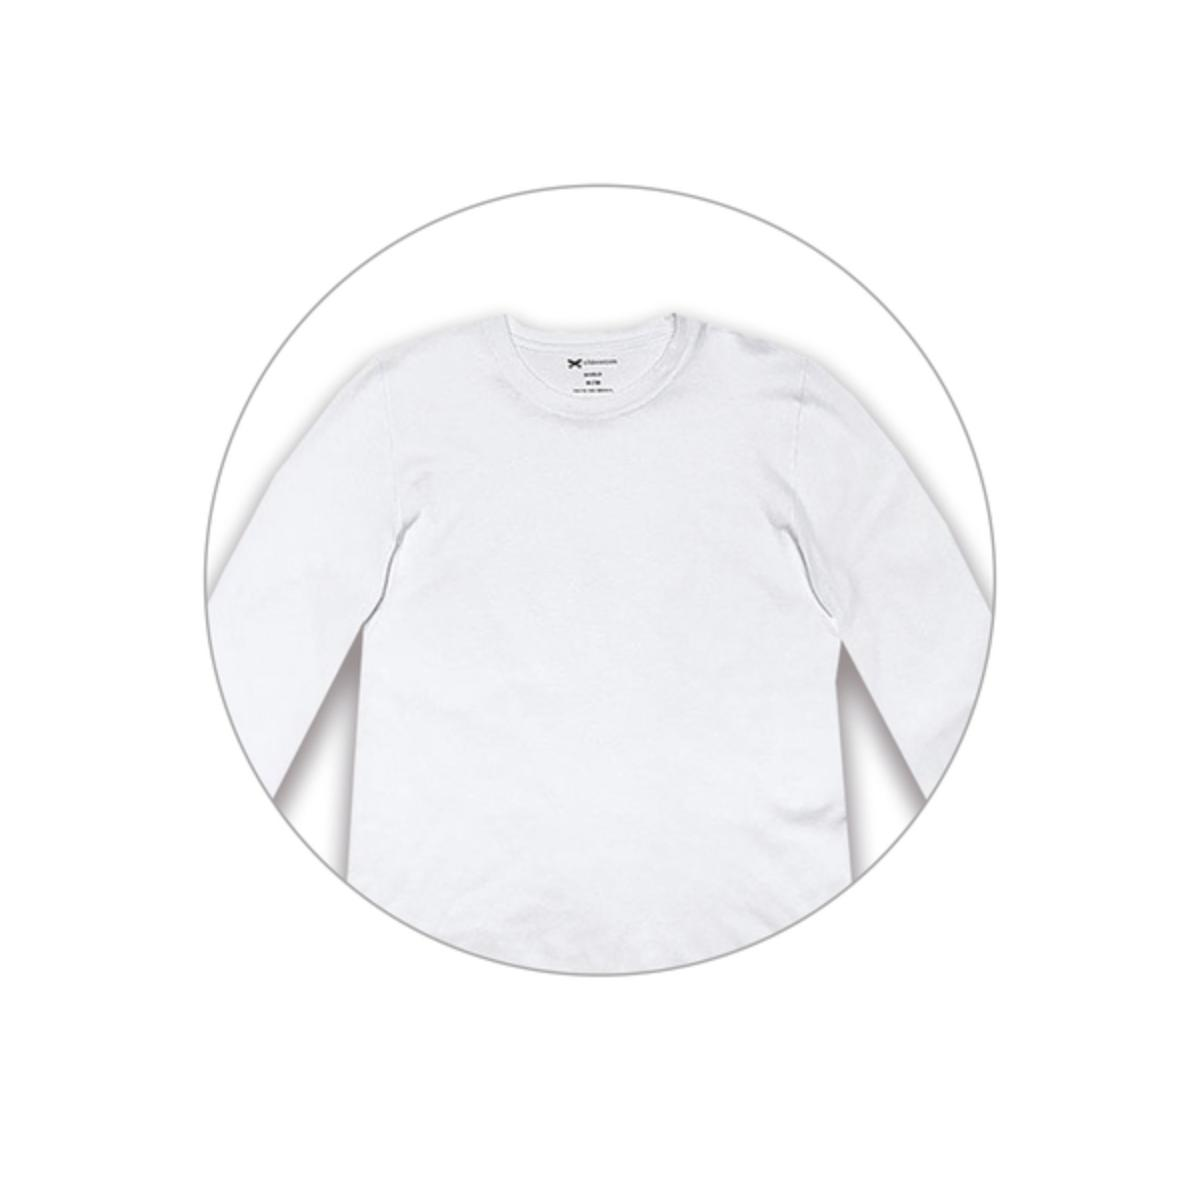 Camiseta Masculina Hering 026x Noa00s Branco